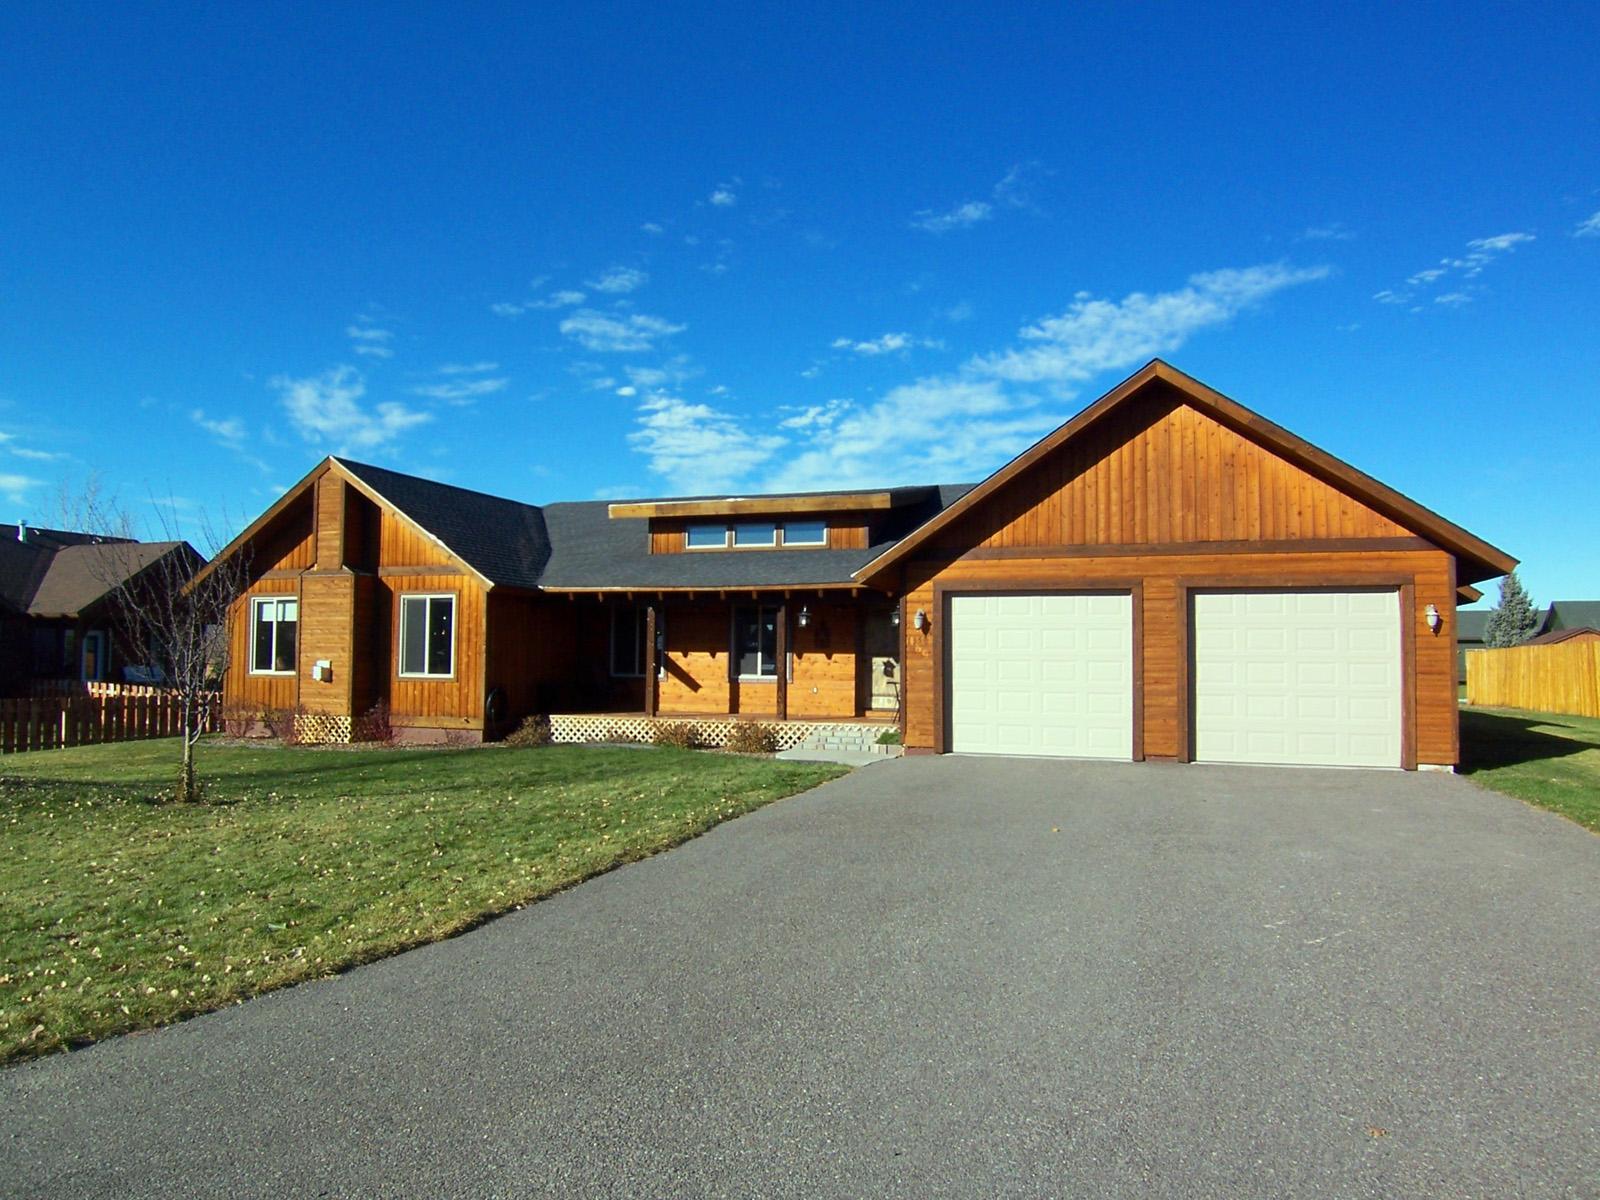 獨棟家庭住宅 為 出售 在 Victor One Level Beauty 1350 Brooktrout Dr. Victor, 愛達荷州 83455 美國